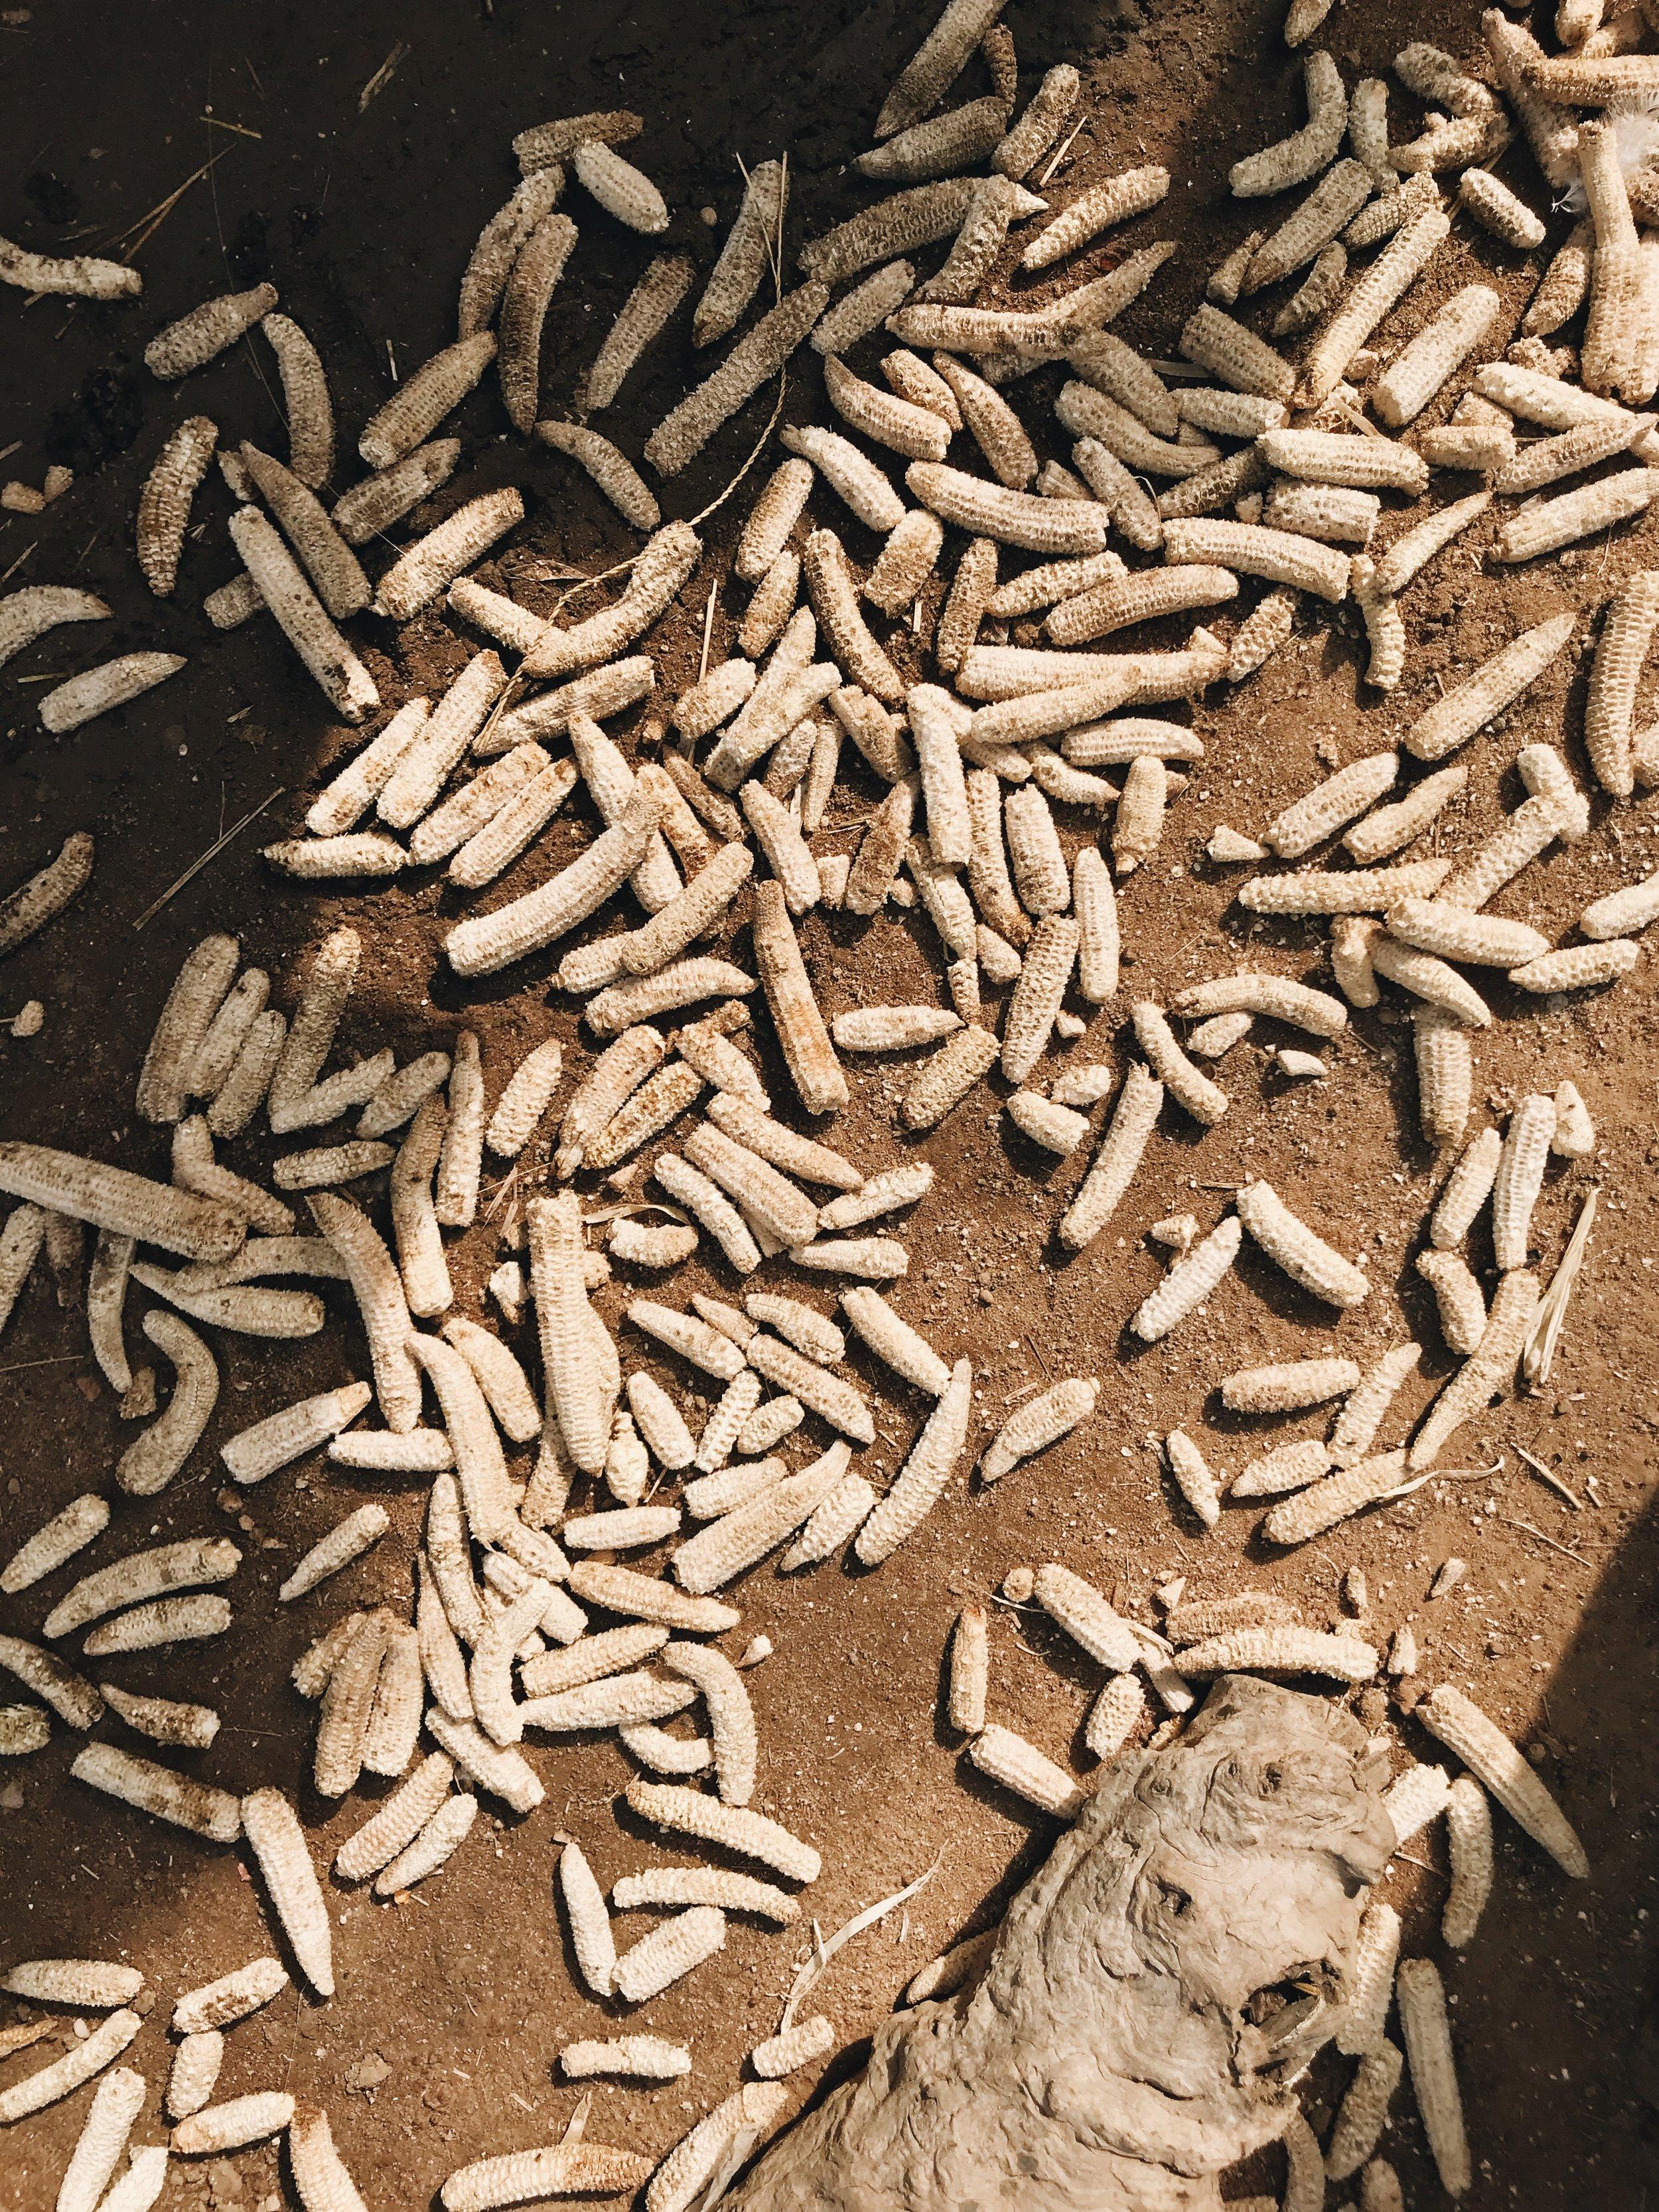 AAKS NATURAL RAFFIA MADE IN AFRICA CB4D478-7393-4234-8973-C879993D6263.jpg